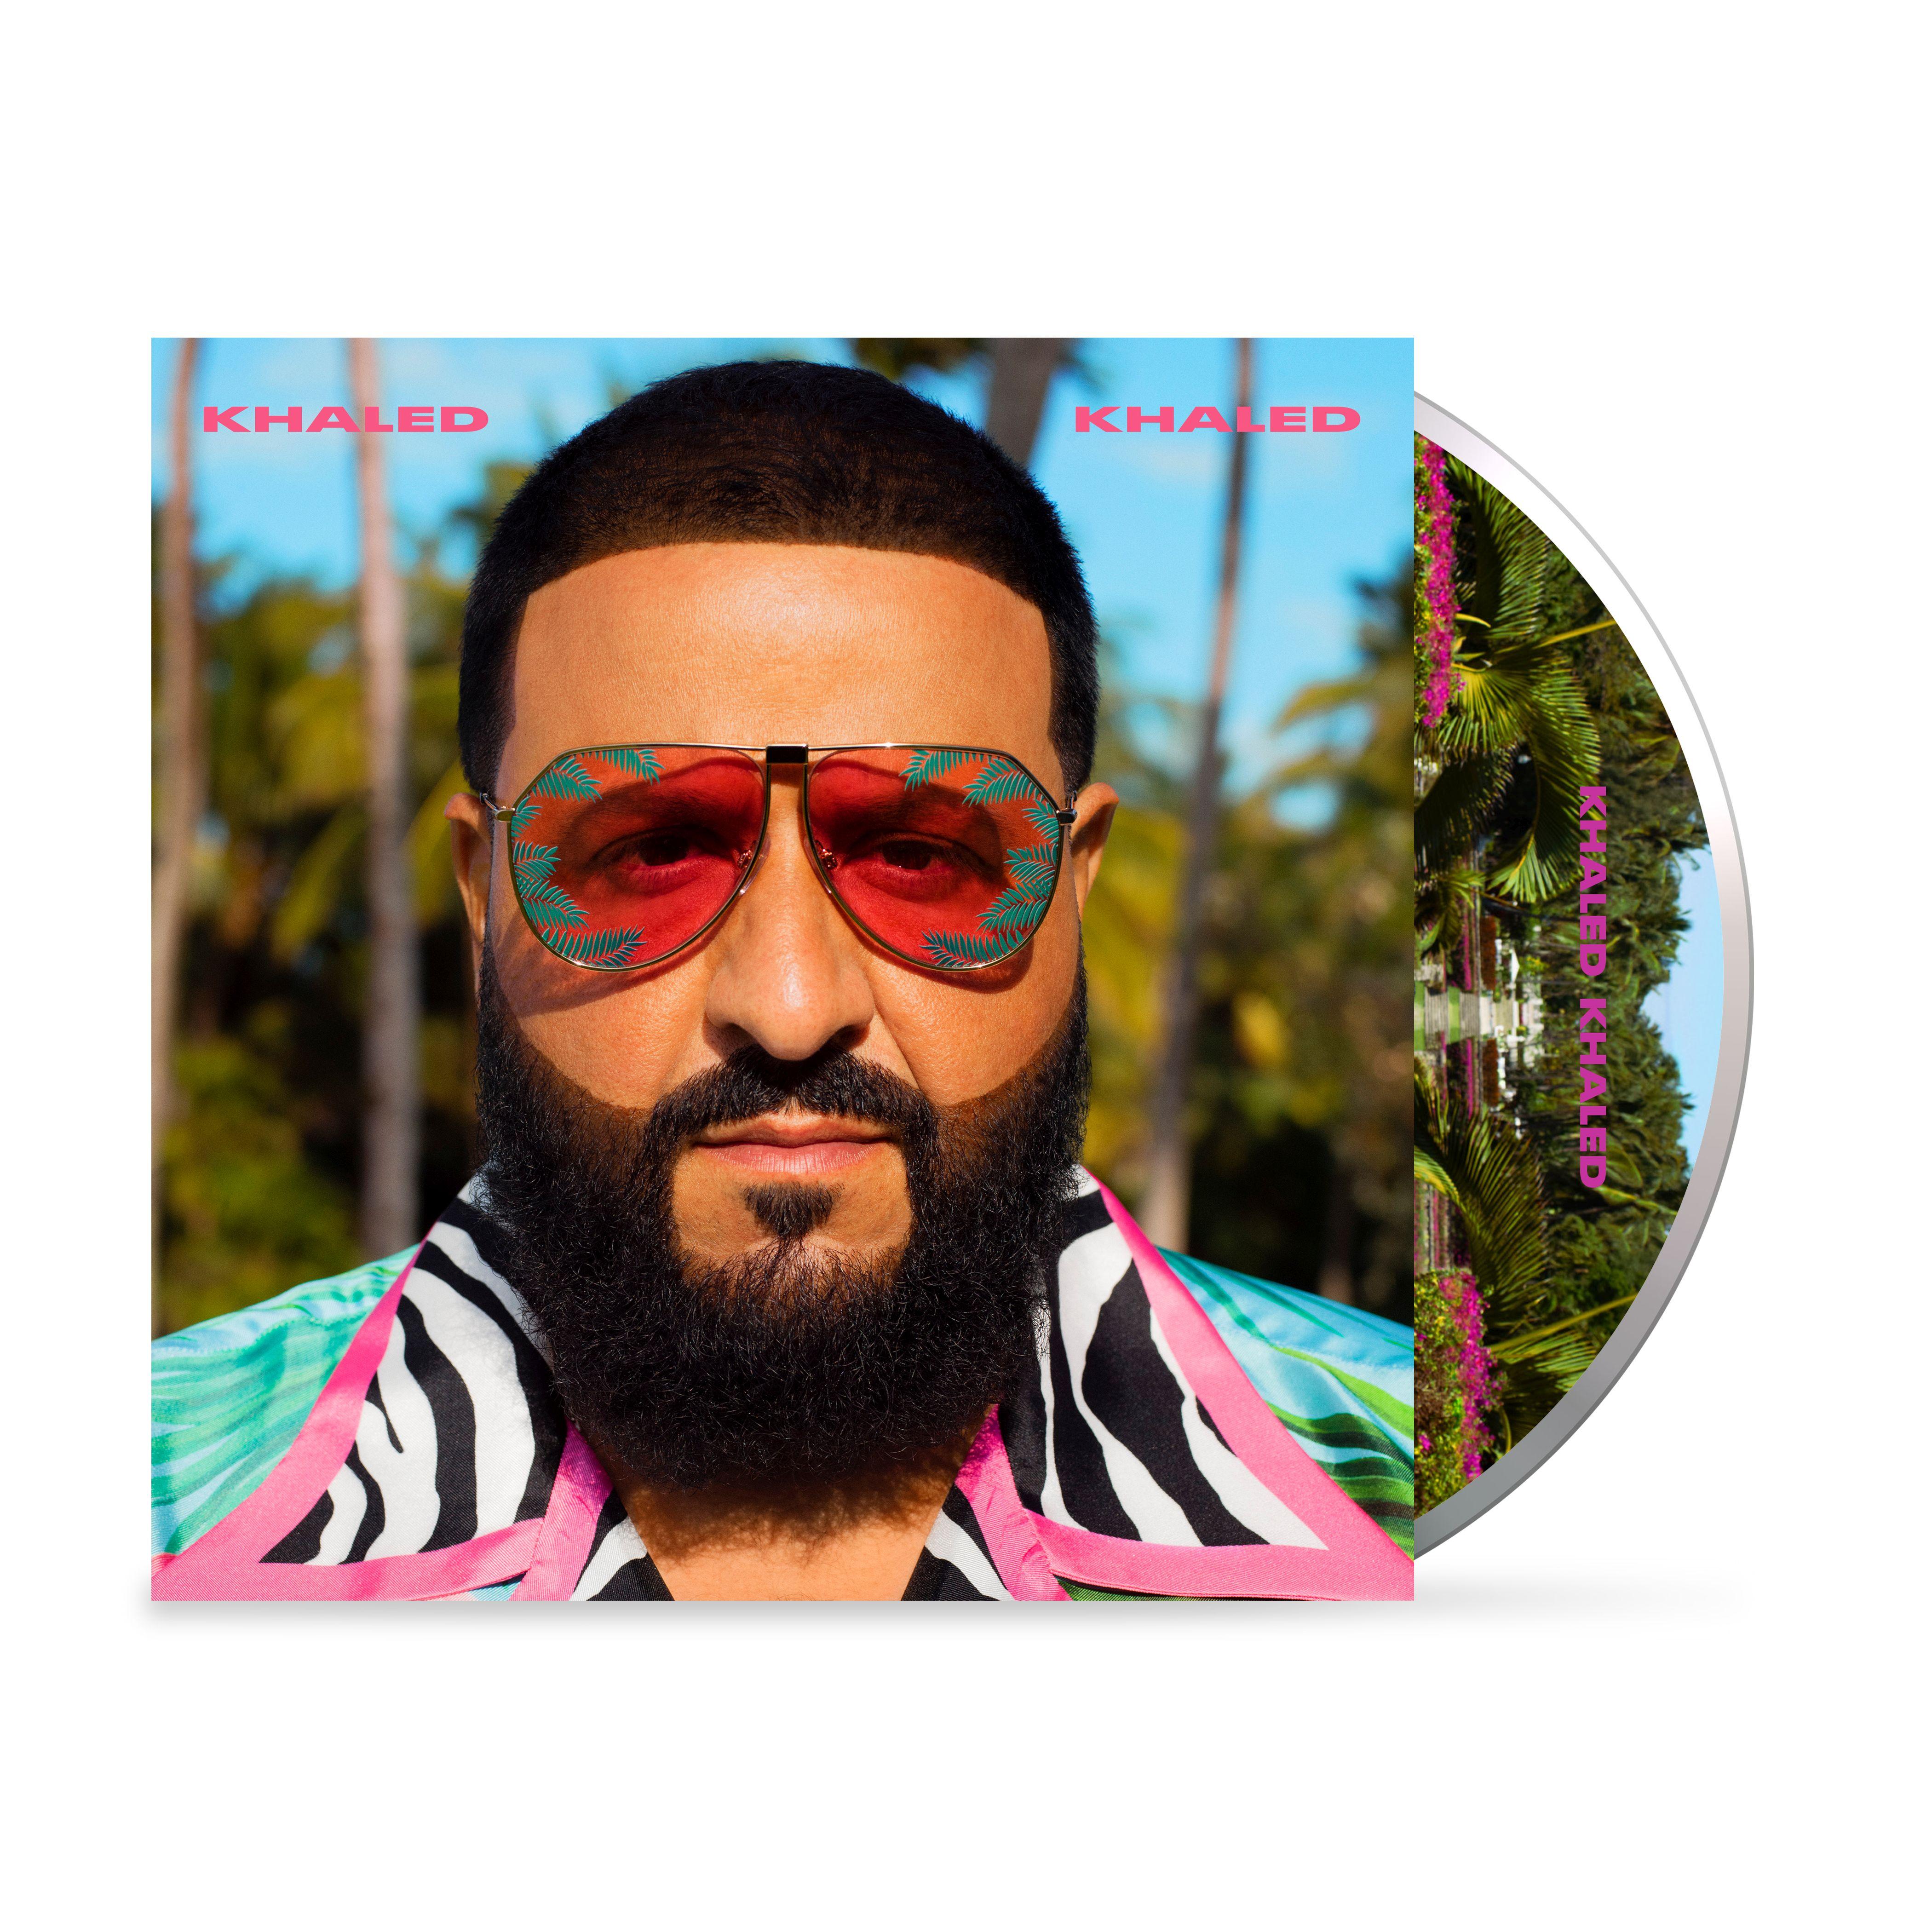 KHALED KHALED Alternate Cover CD